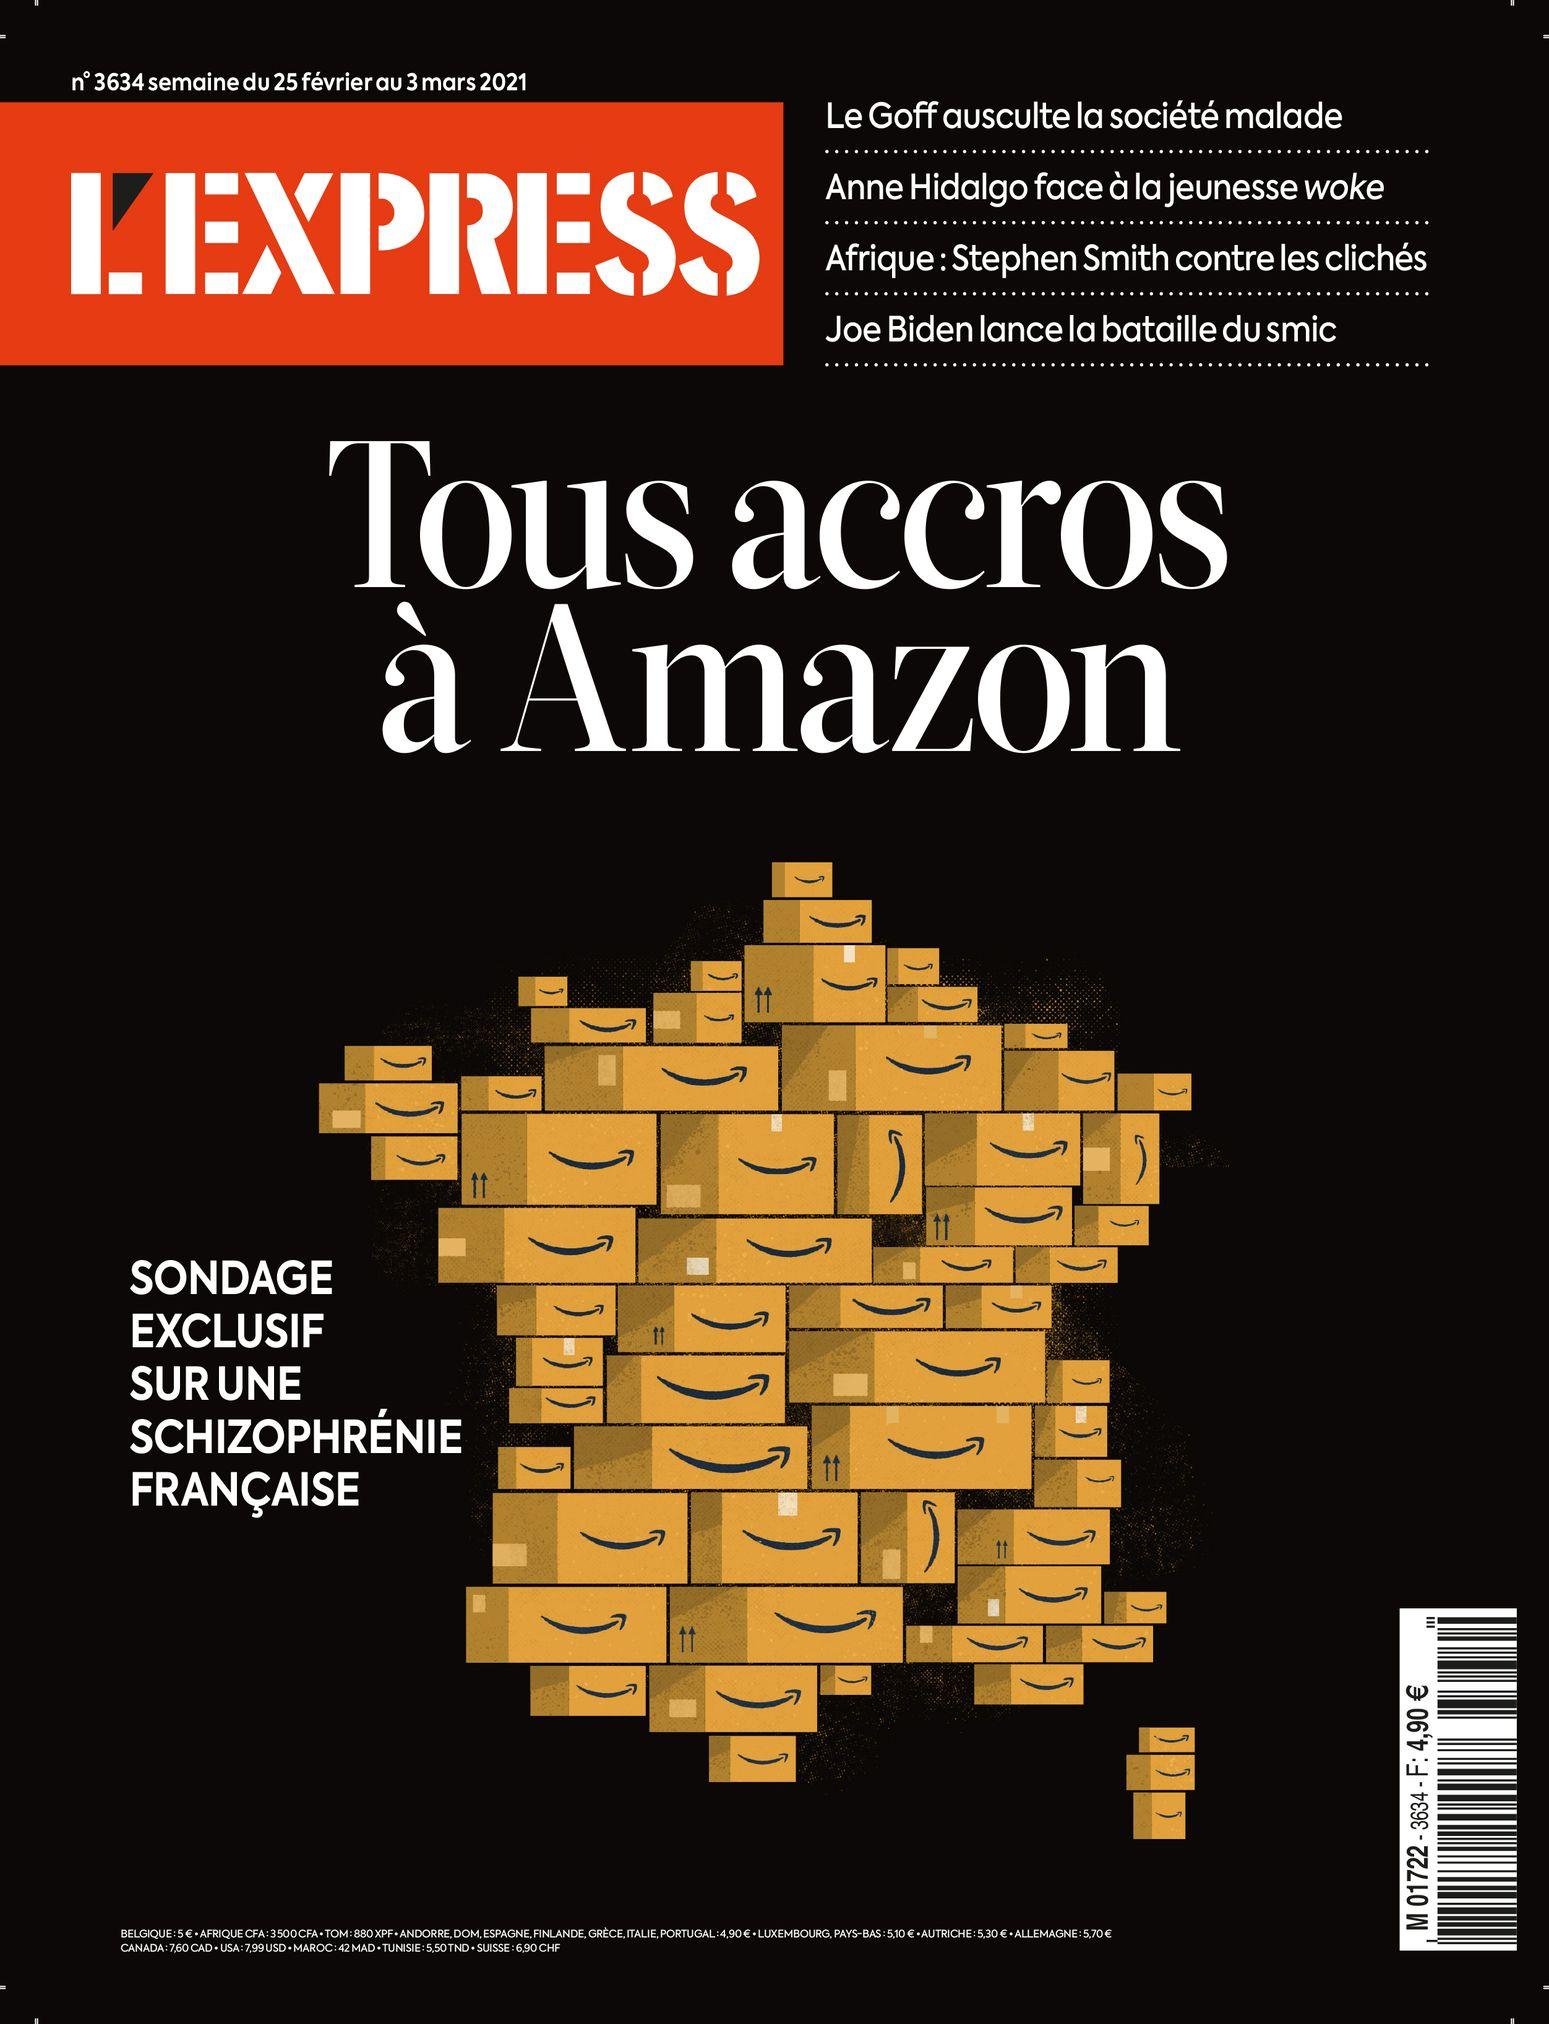 garance-illustration-LExpress-France-is-addict-to-Amazon_web